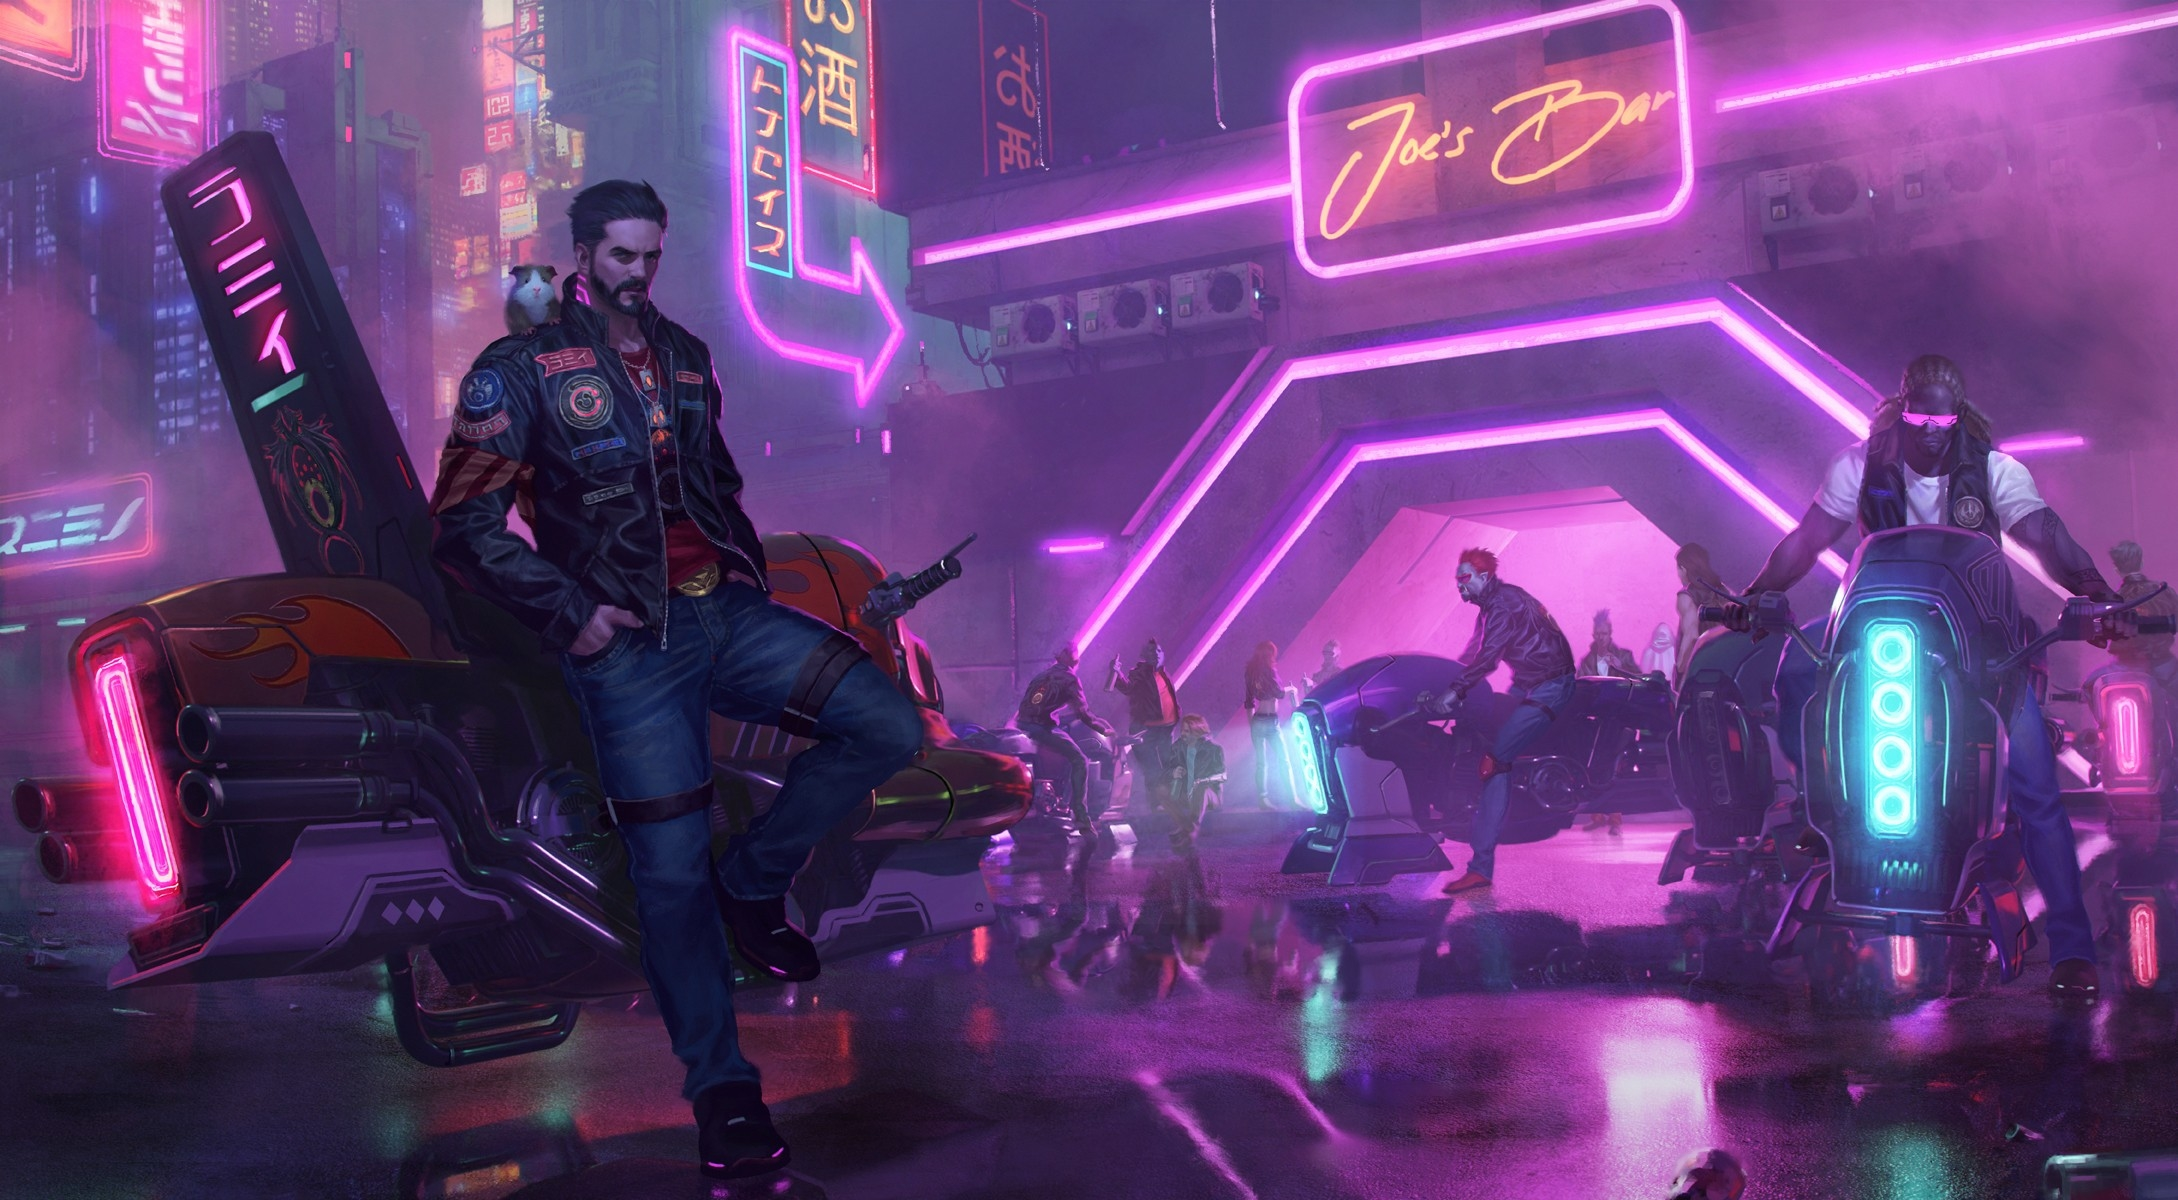 3840x2400 Neon Future Cyberpunk Male 4K 3840x2400 ...